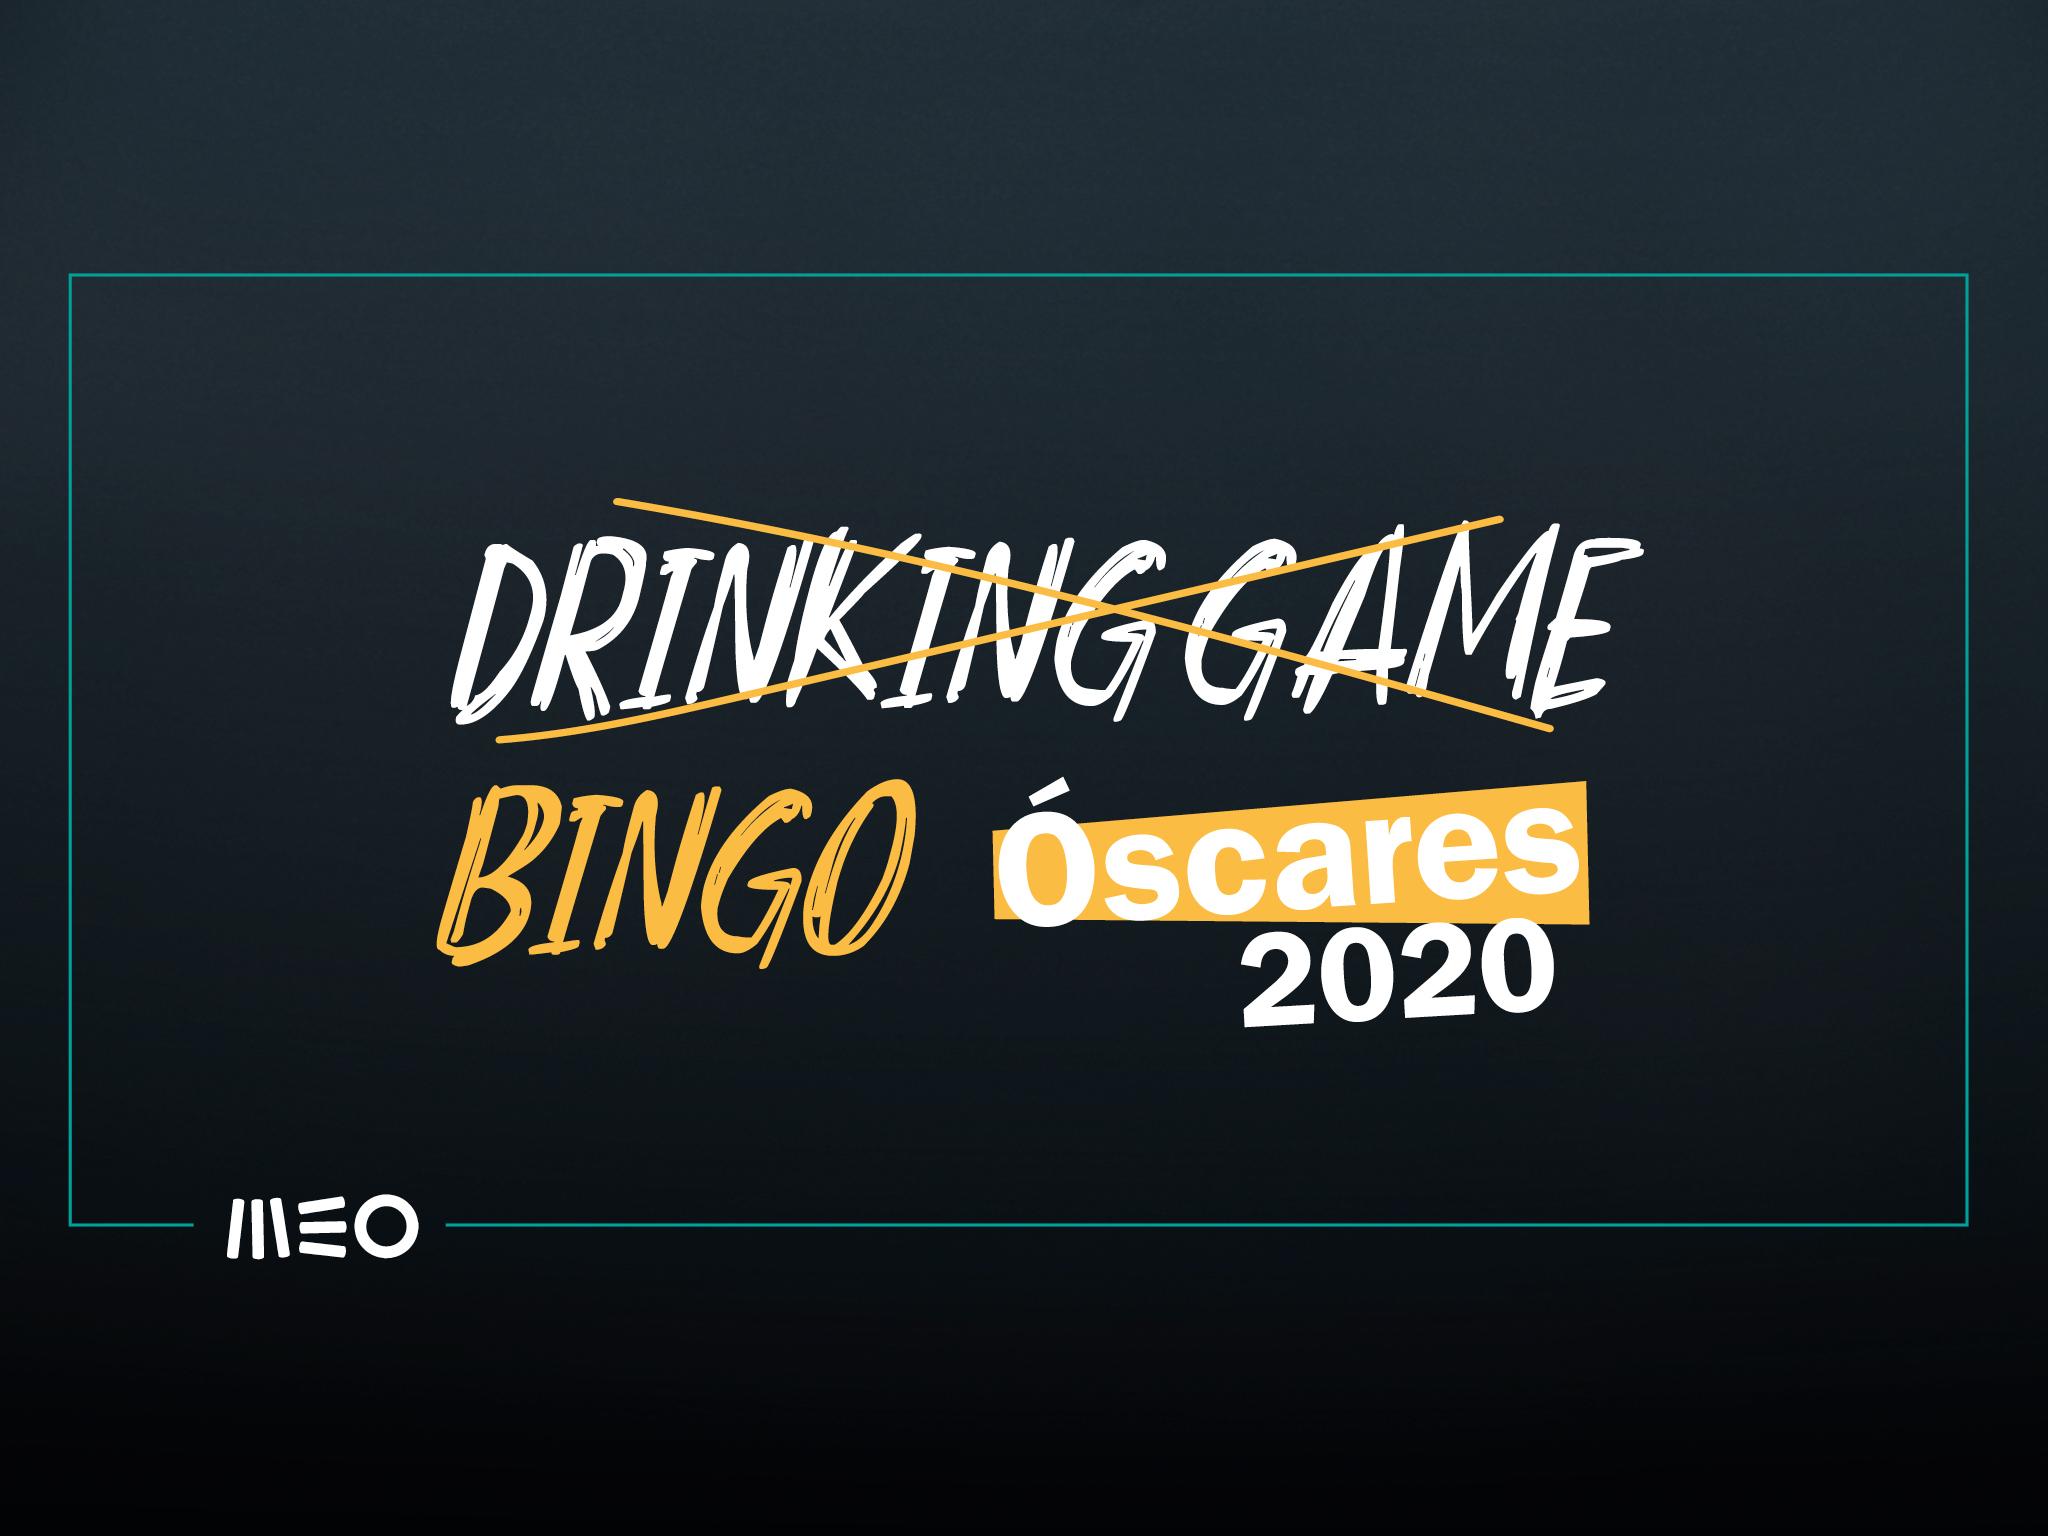 Siga para bingo